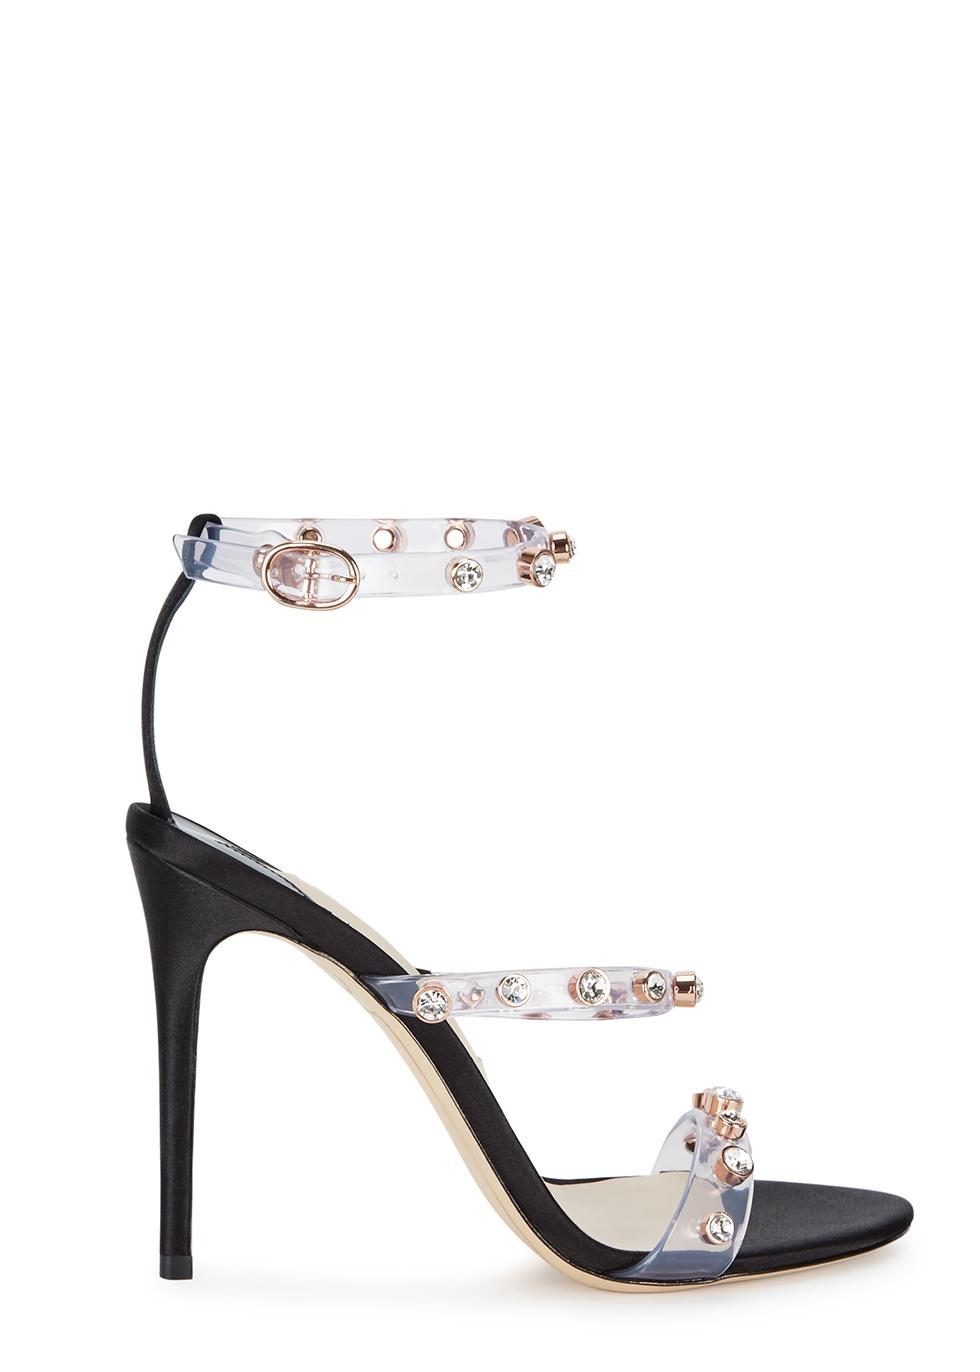 3e1ef86d12de68 Sophia Webster Shoes